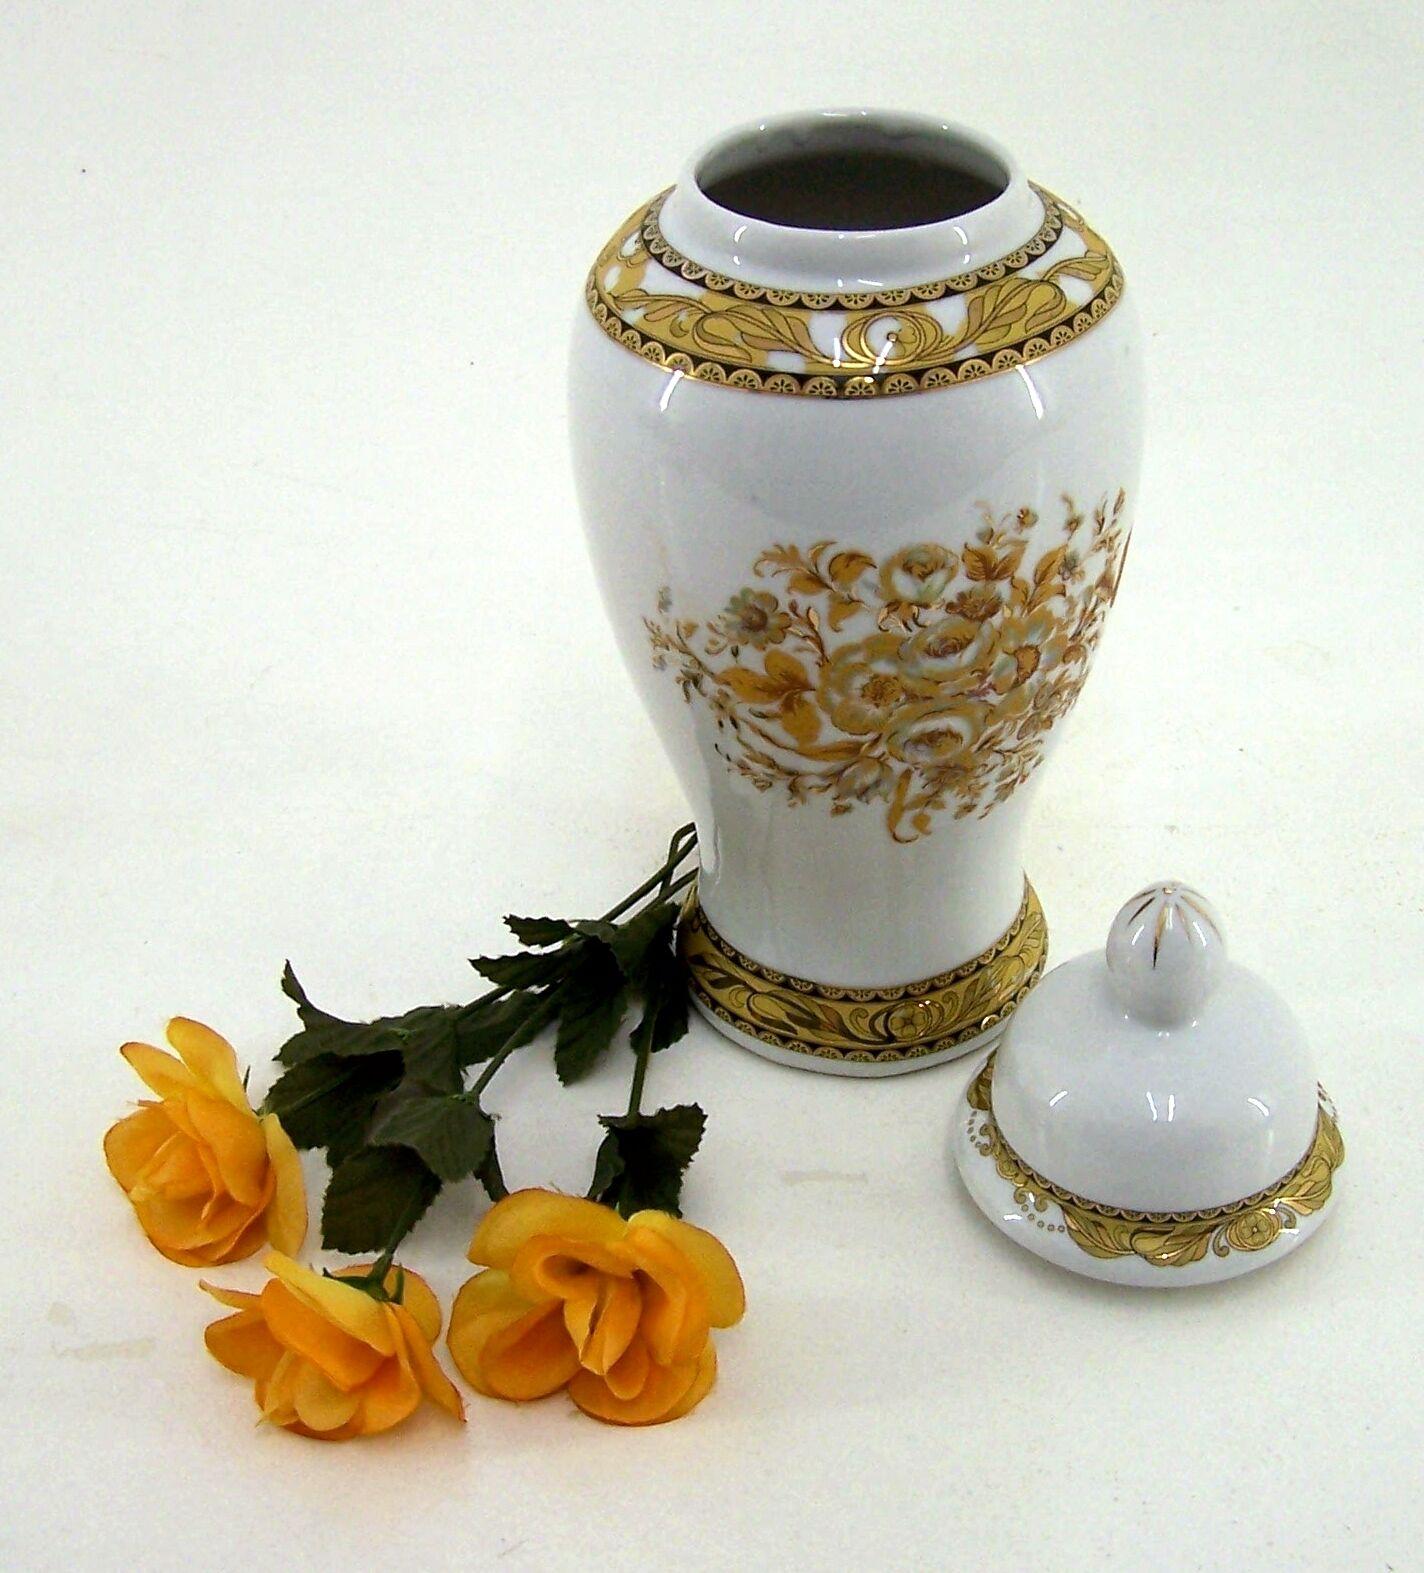 porzellan vase mit deckel goldornamente deckelvase handarbeit h he ca 31 cm eur 39 99. Black Bedroom Furniture Sets. Home Design Ideas